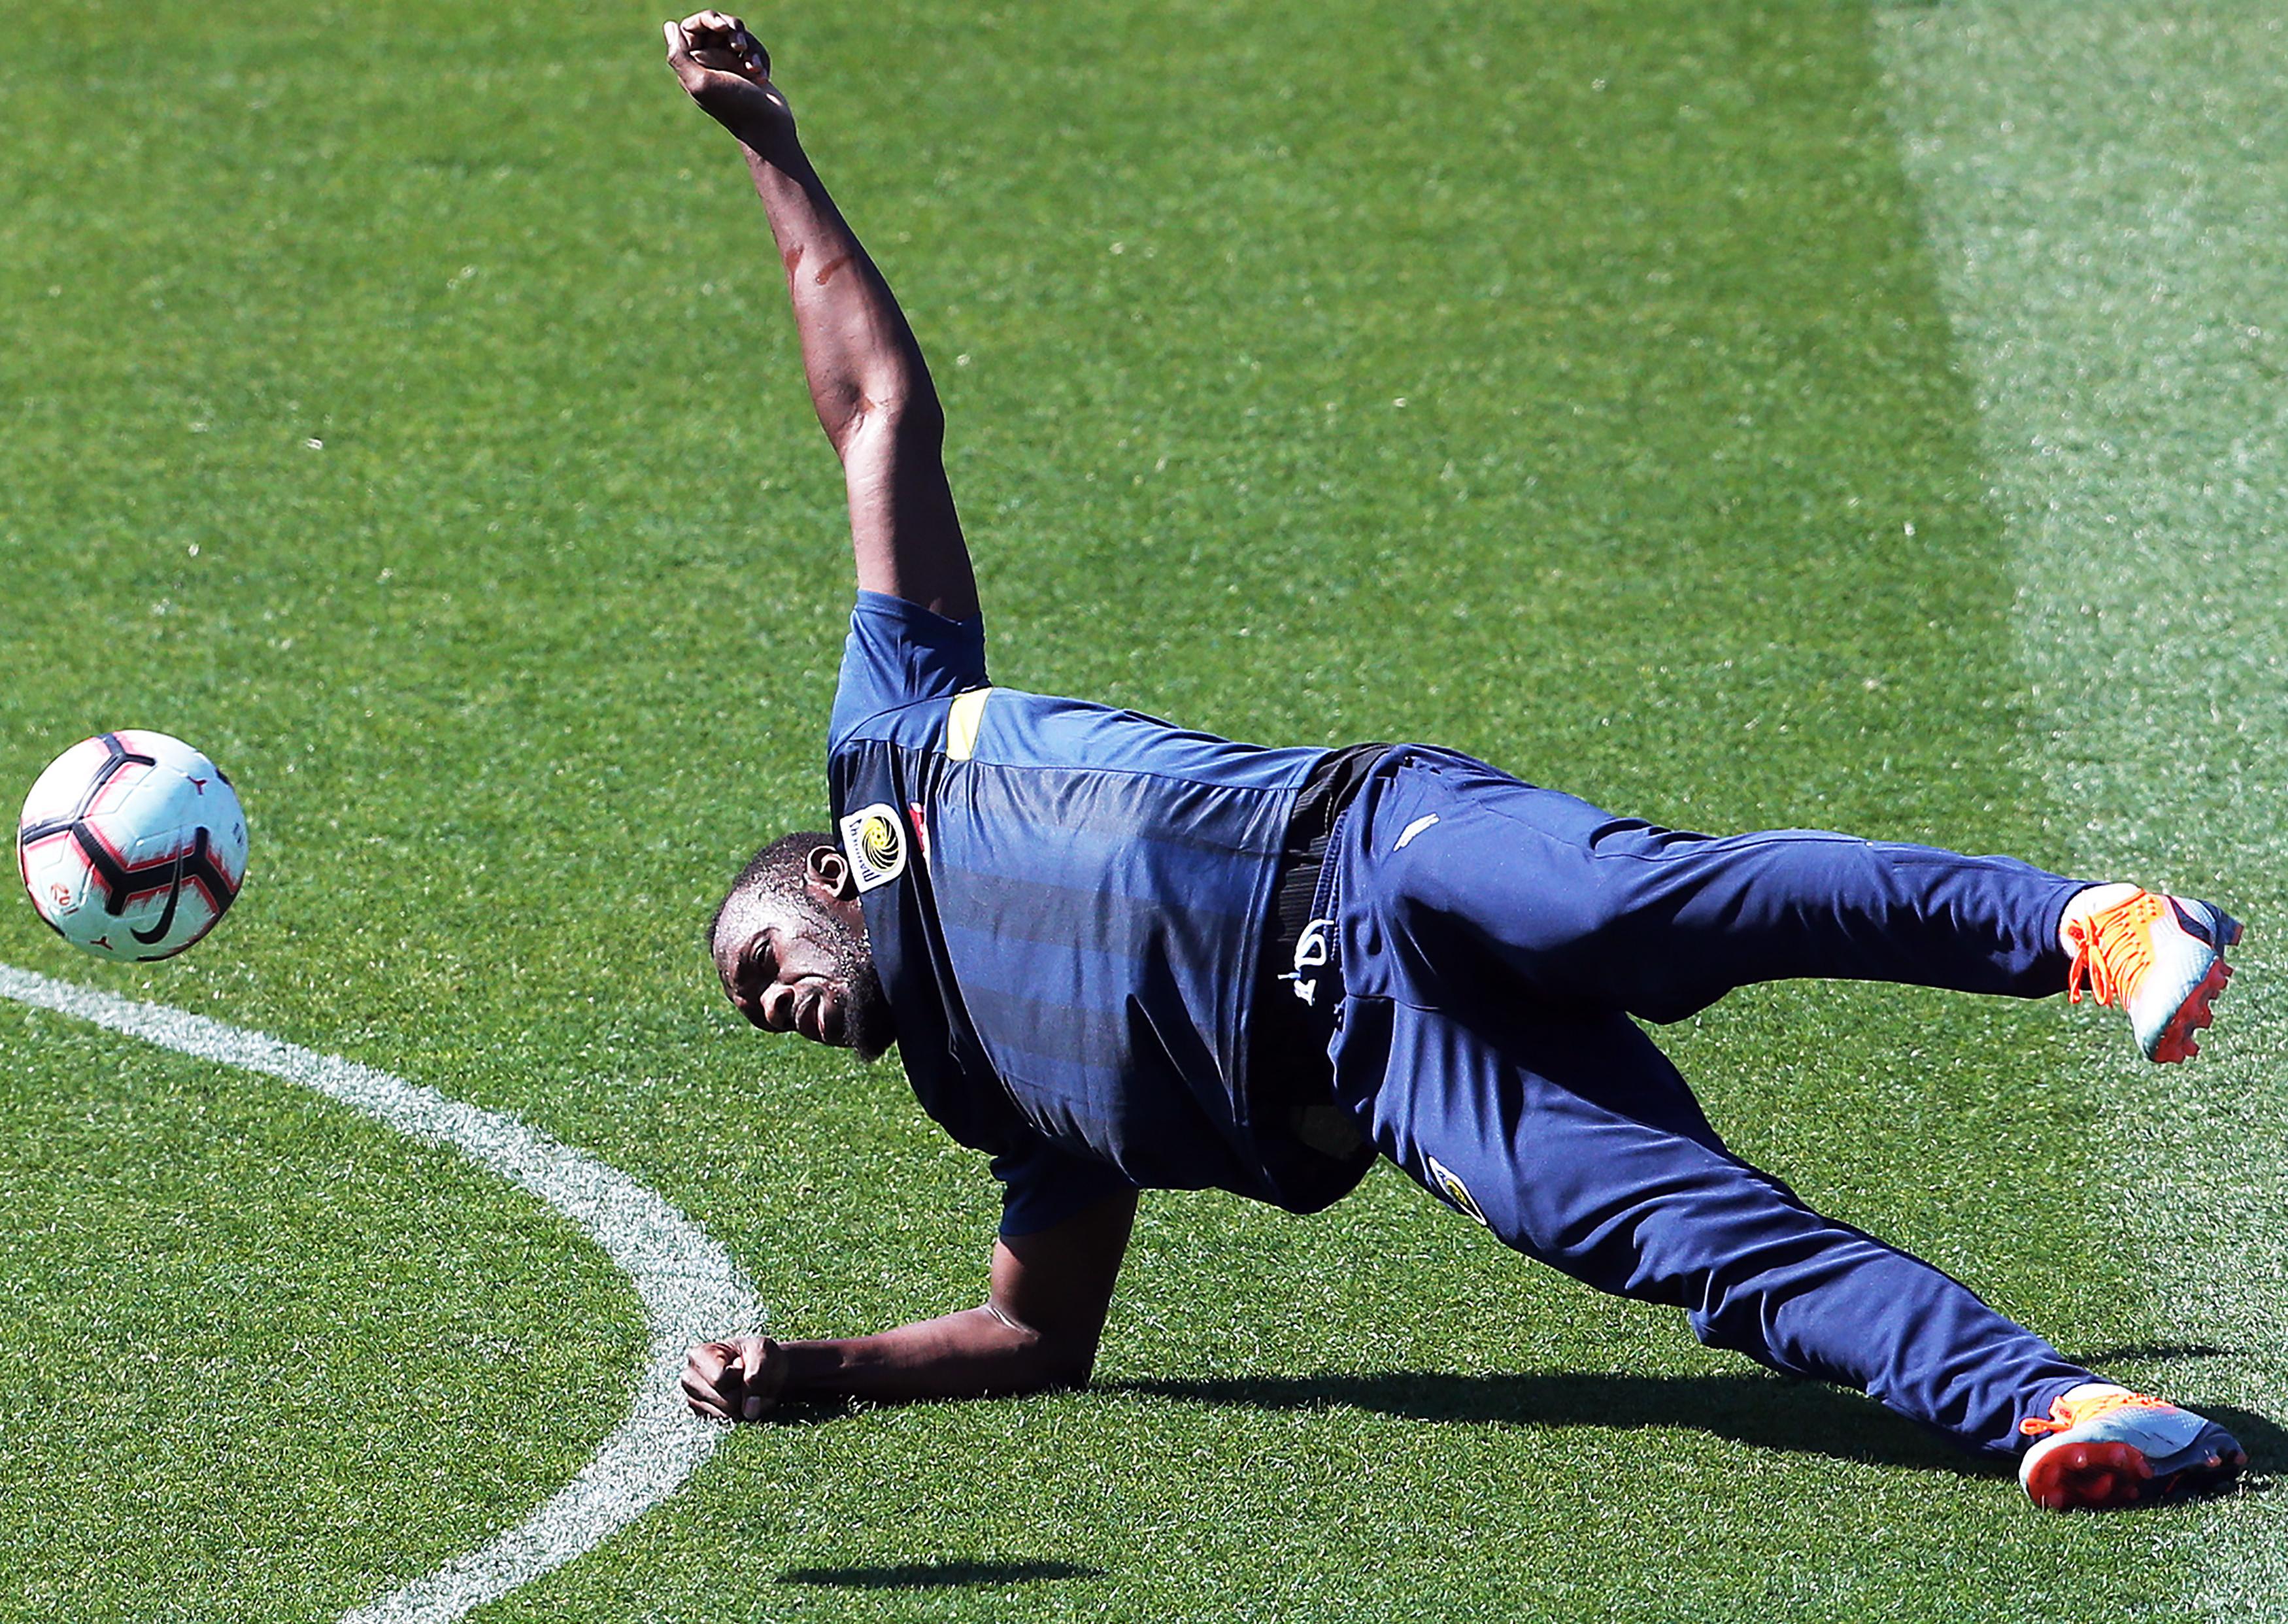 Usain Bolt már nem akar profi focista lenni